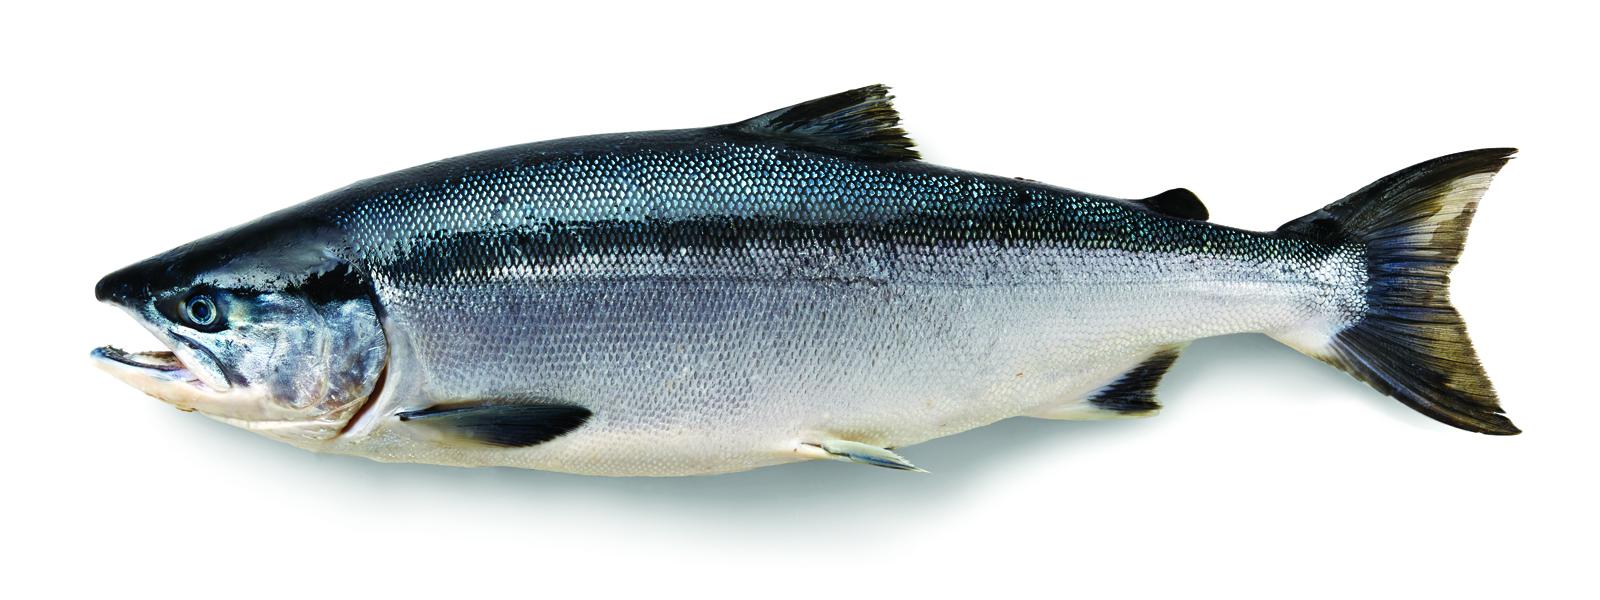 Alaska sockeye salmon